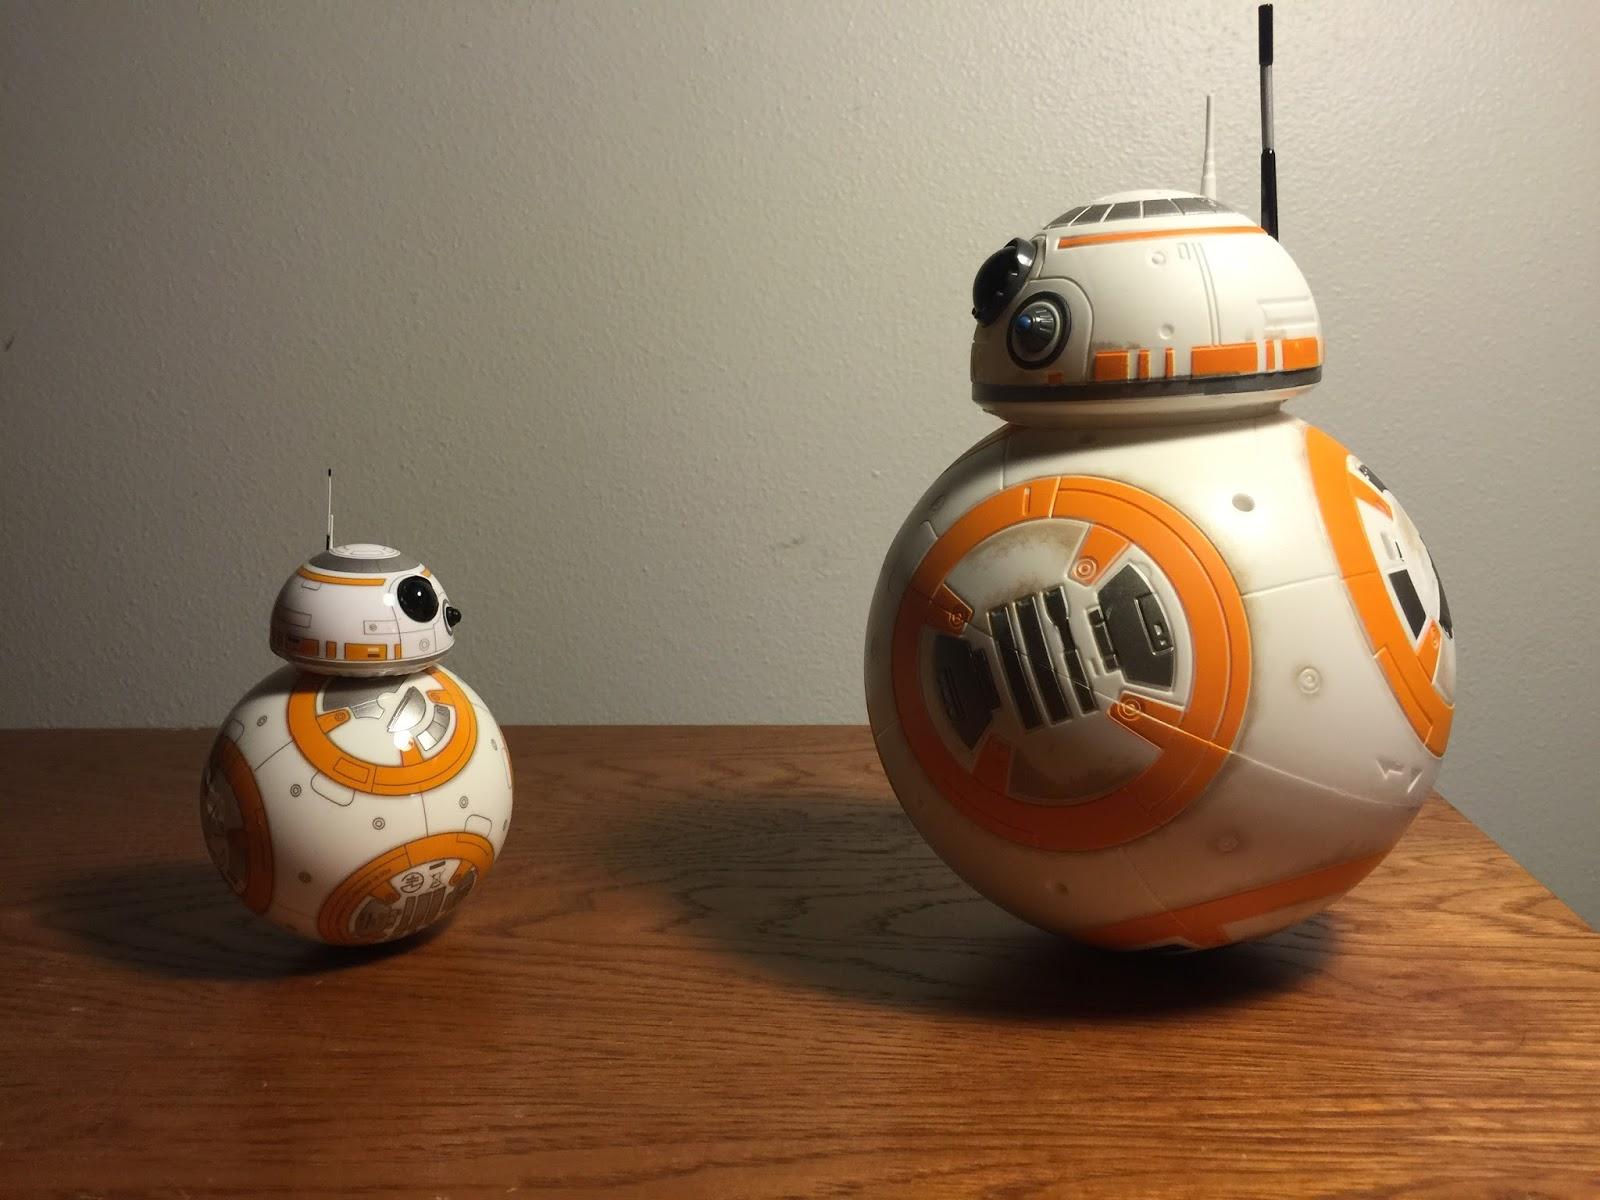 Hasbro B3926EU4 – Star Wars E7 ferngesteuerter Droide BB-8 ...  Hasbro B3926EU4...